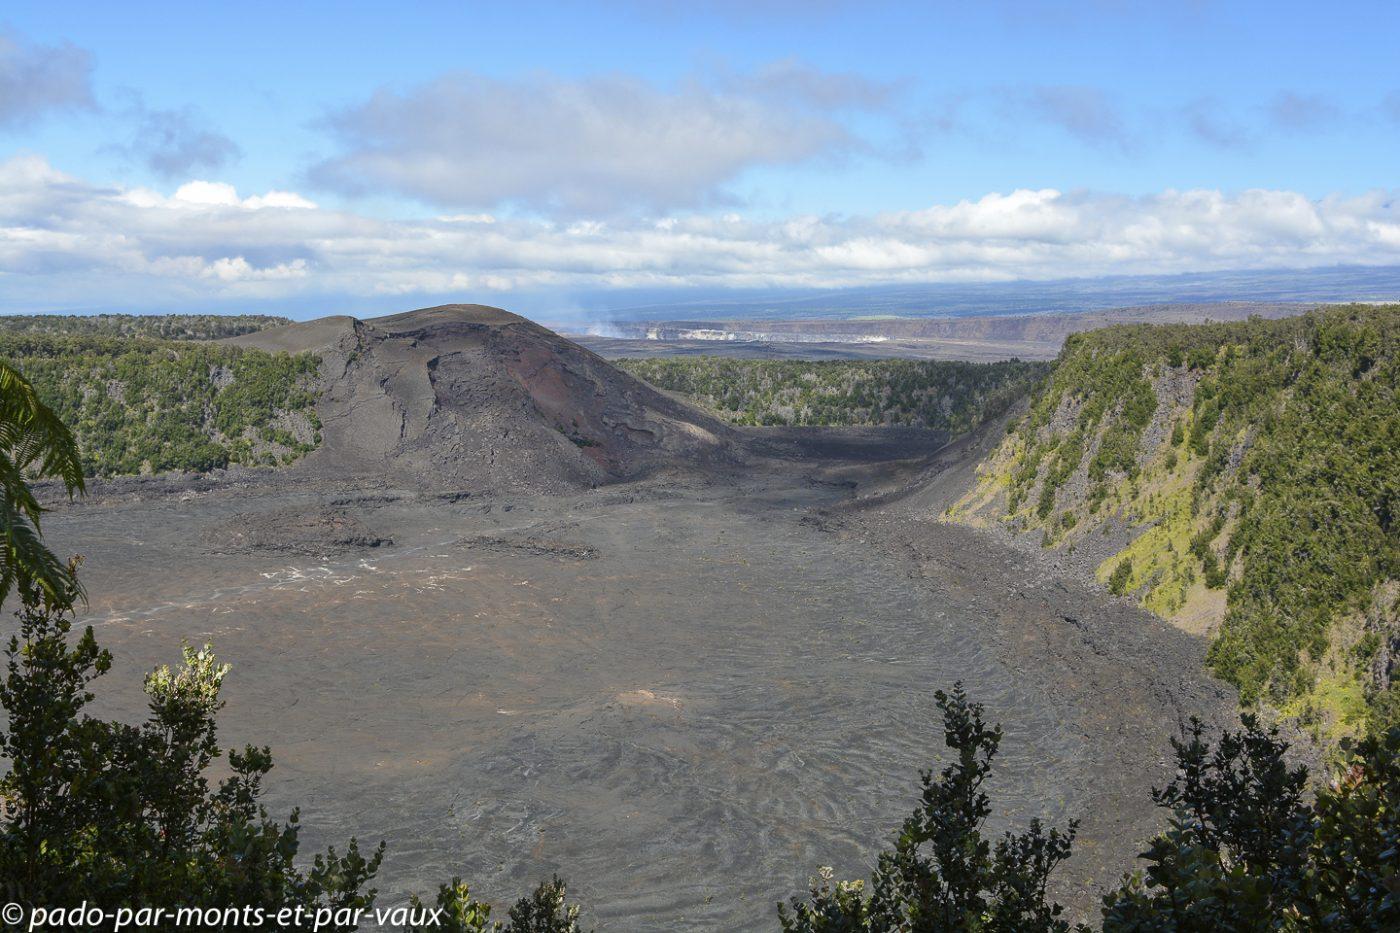 Big Island - parc des volcans